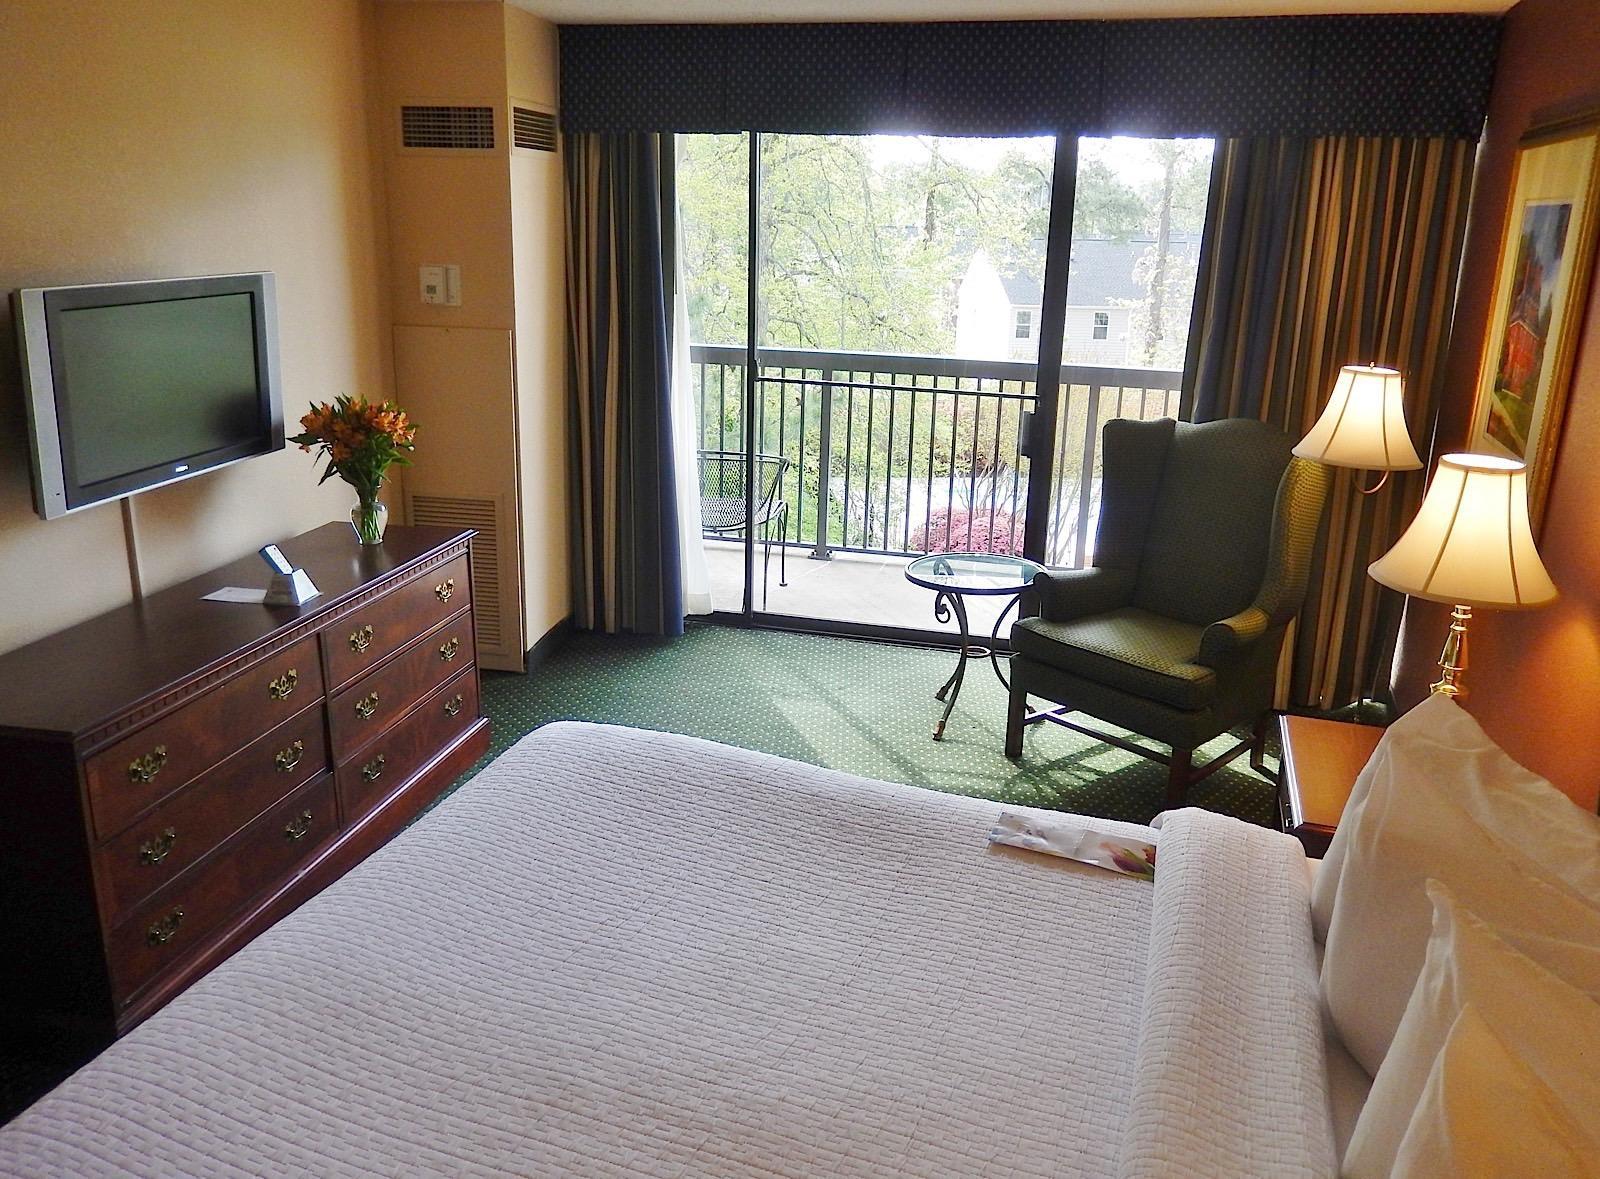 Fort Magruder Hotel and Conference Center image 1